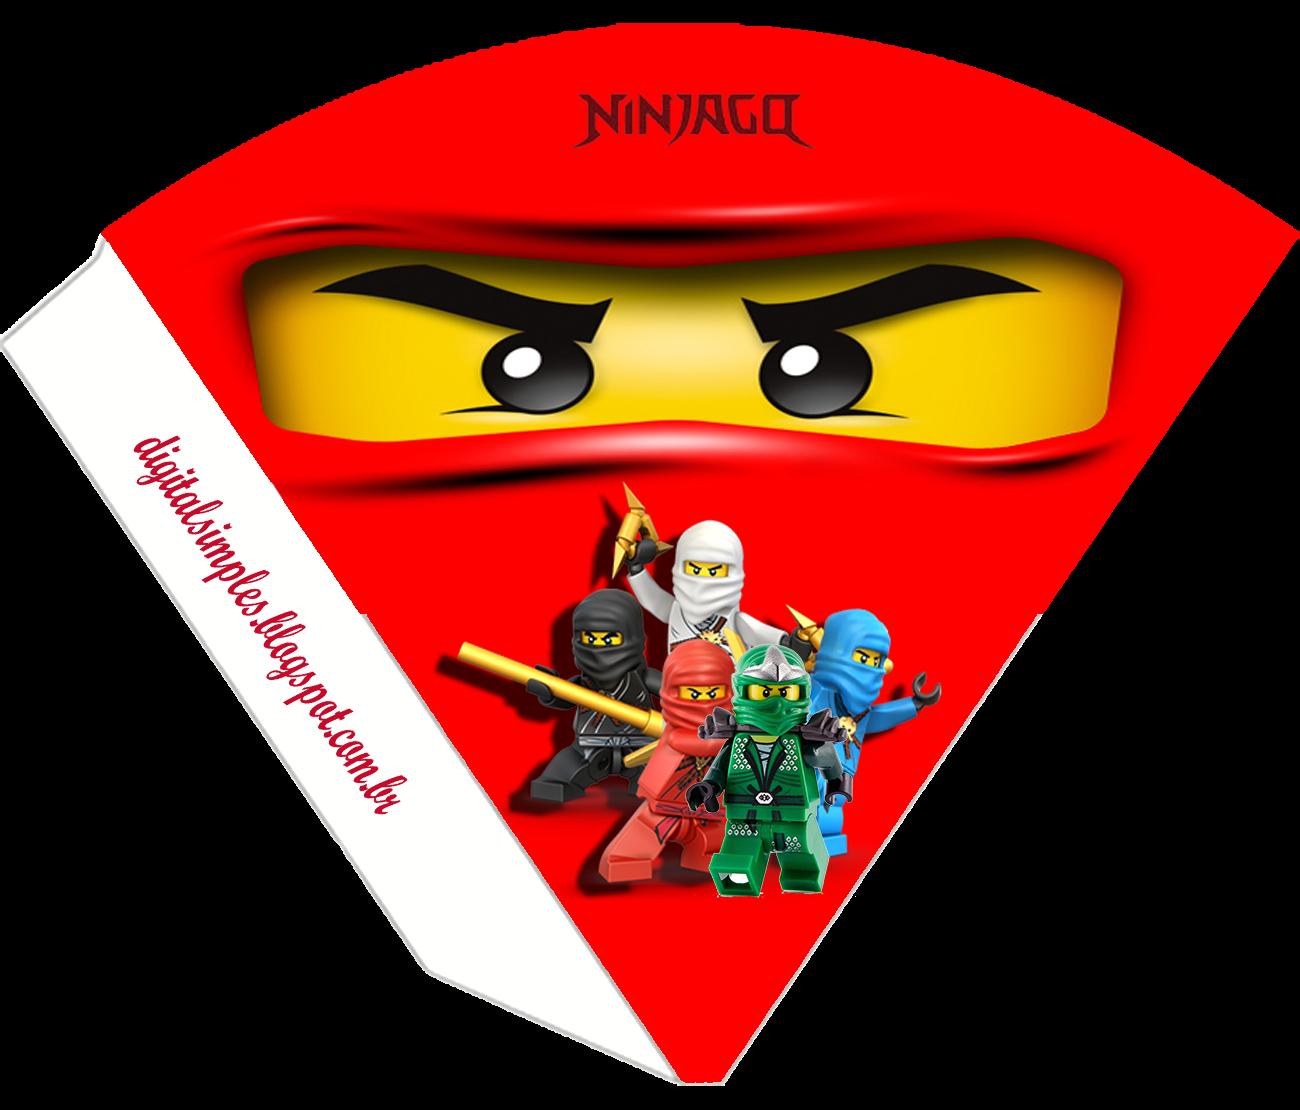 Ninjago Party Free Printable Kit